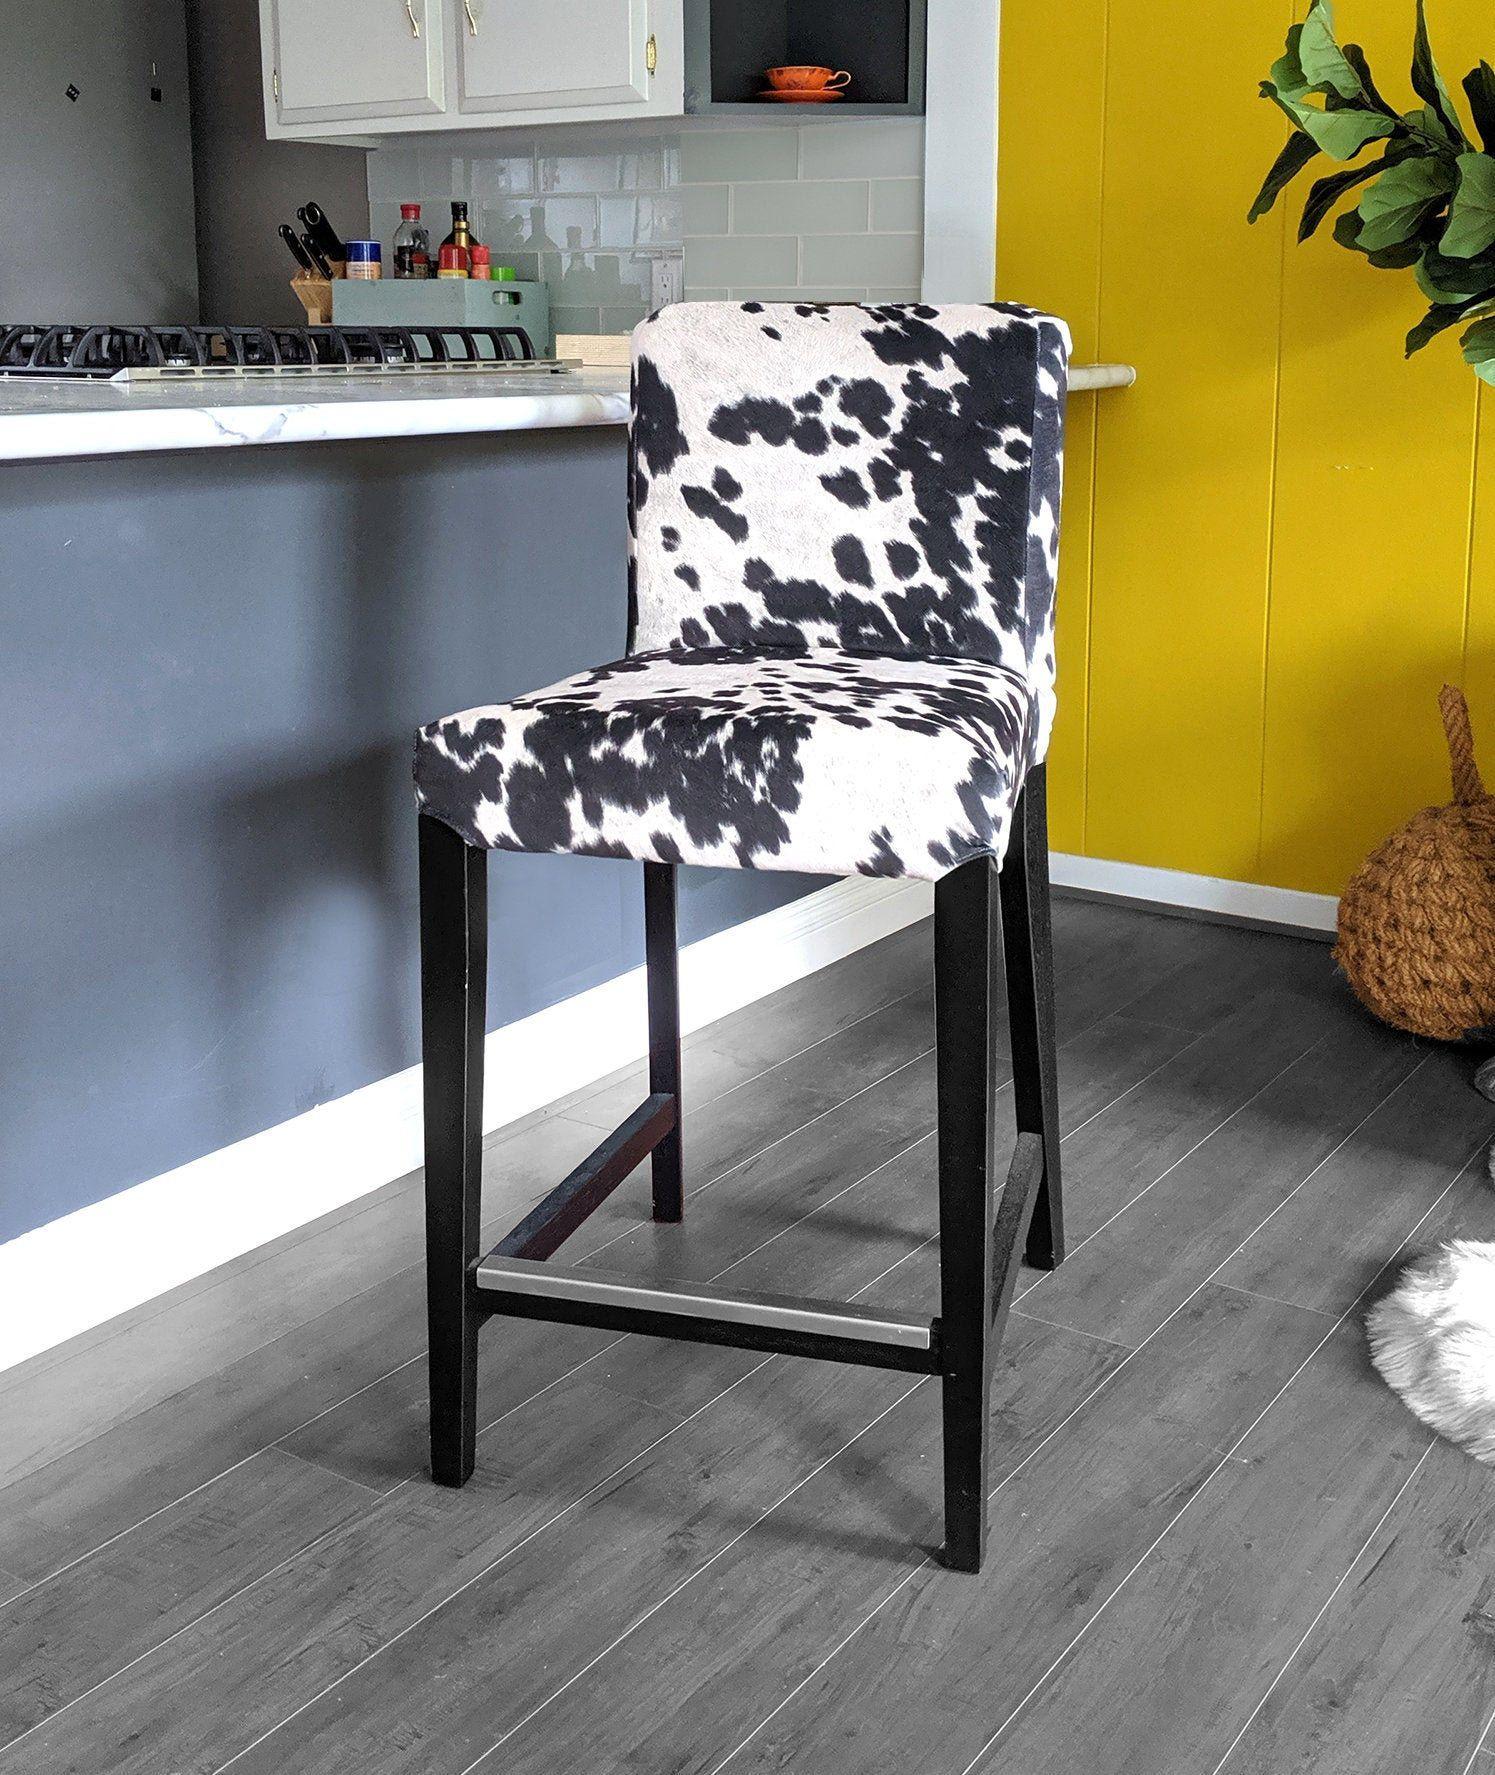 Ikea Henriksdal Bar Stool Chair Cover Black Cow Print Ikea Slip